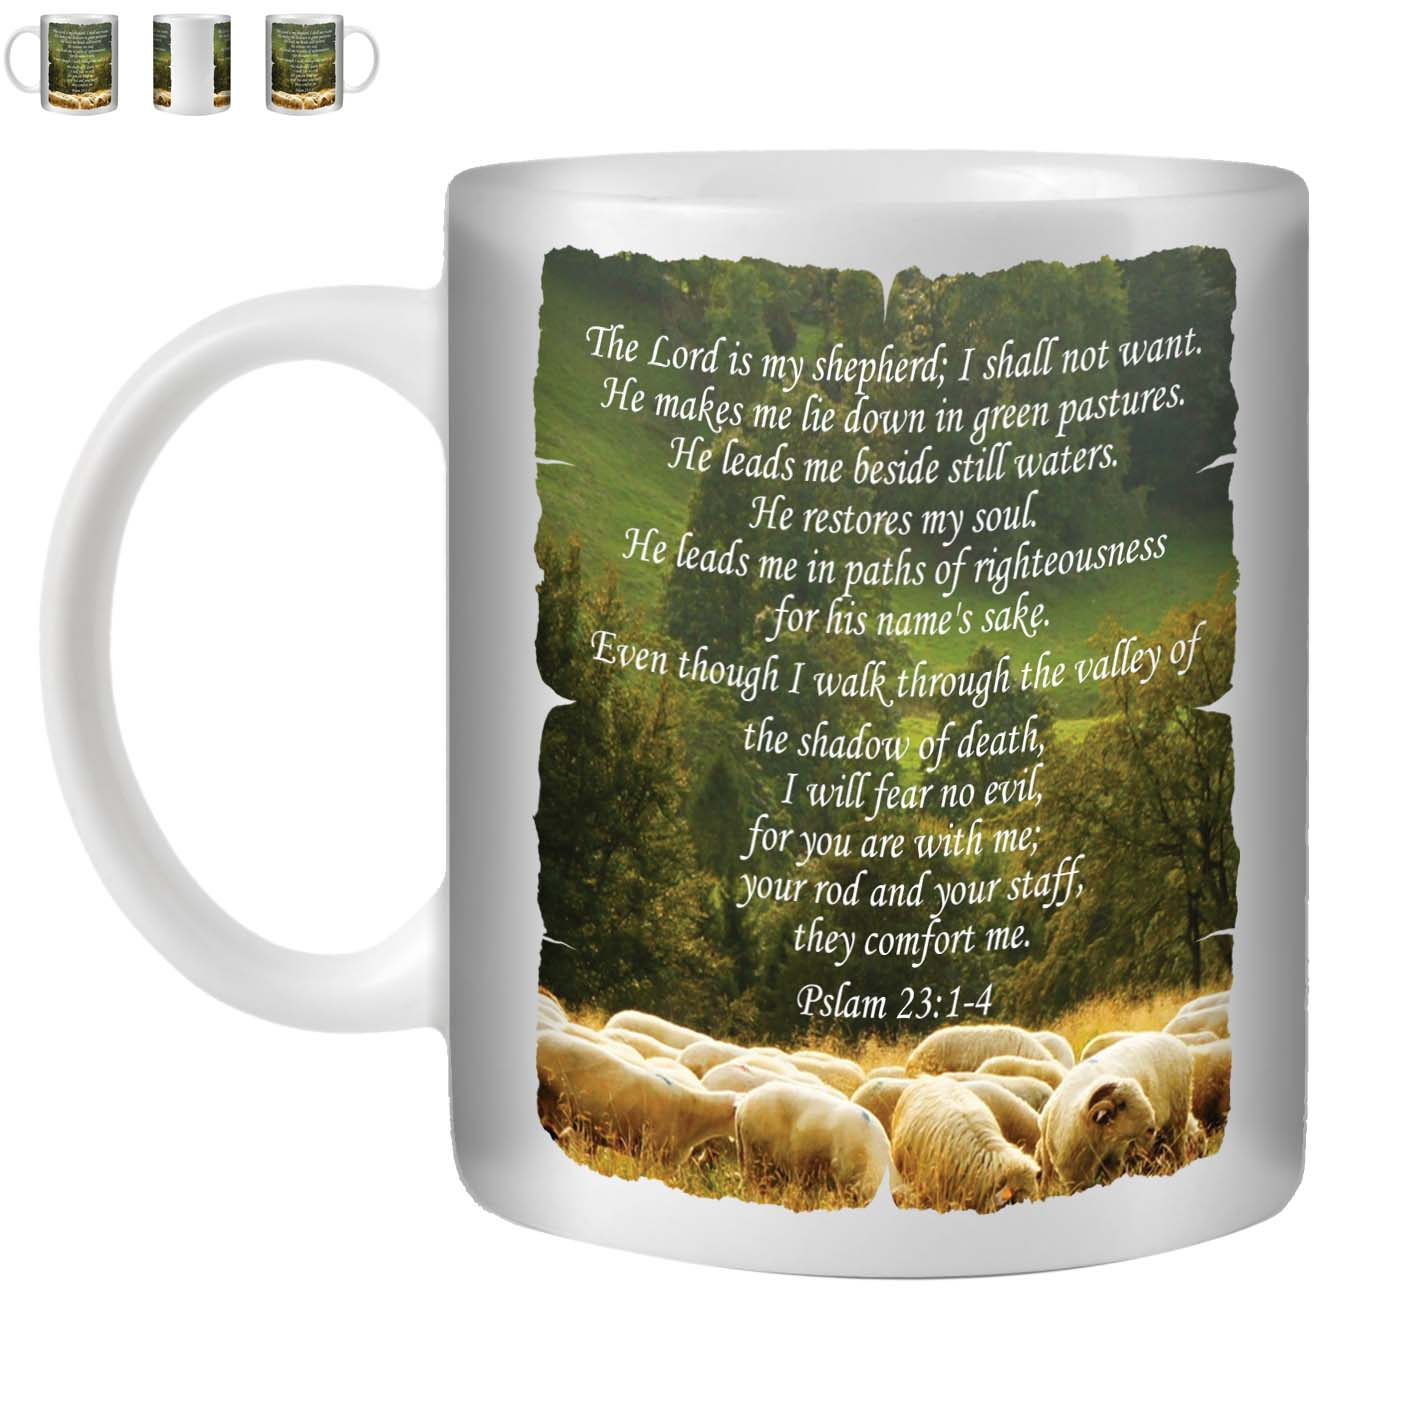 Details about STUFF4 Tea/Coffee Mug/Cup 350ml/Christian Bible Verse/ST10